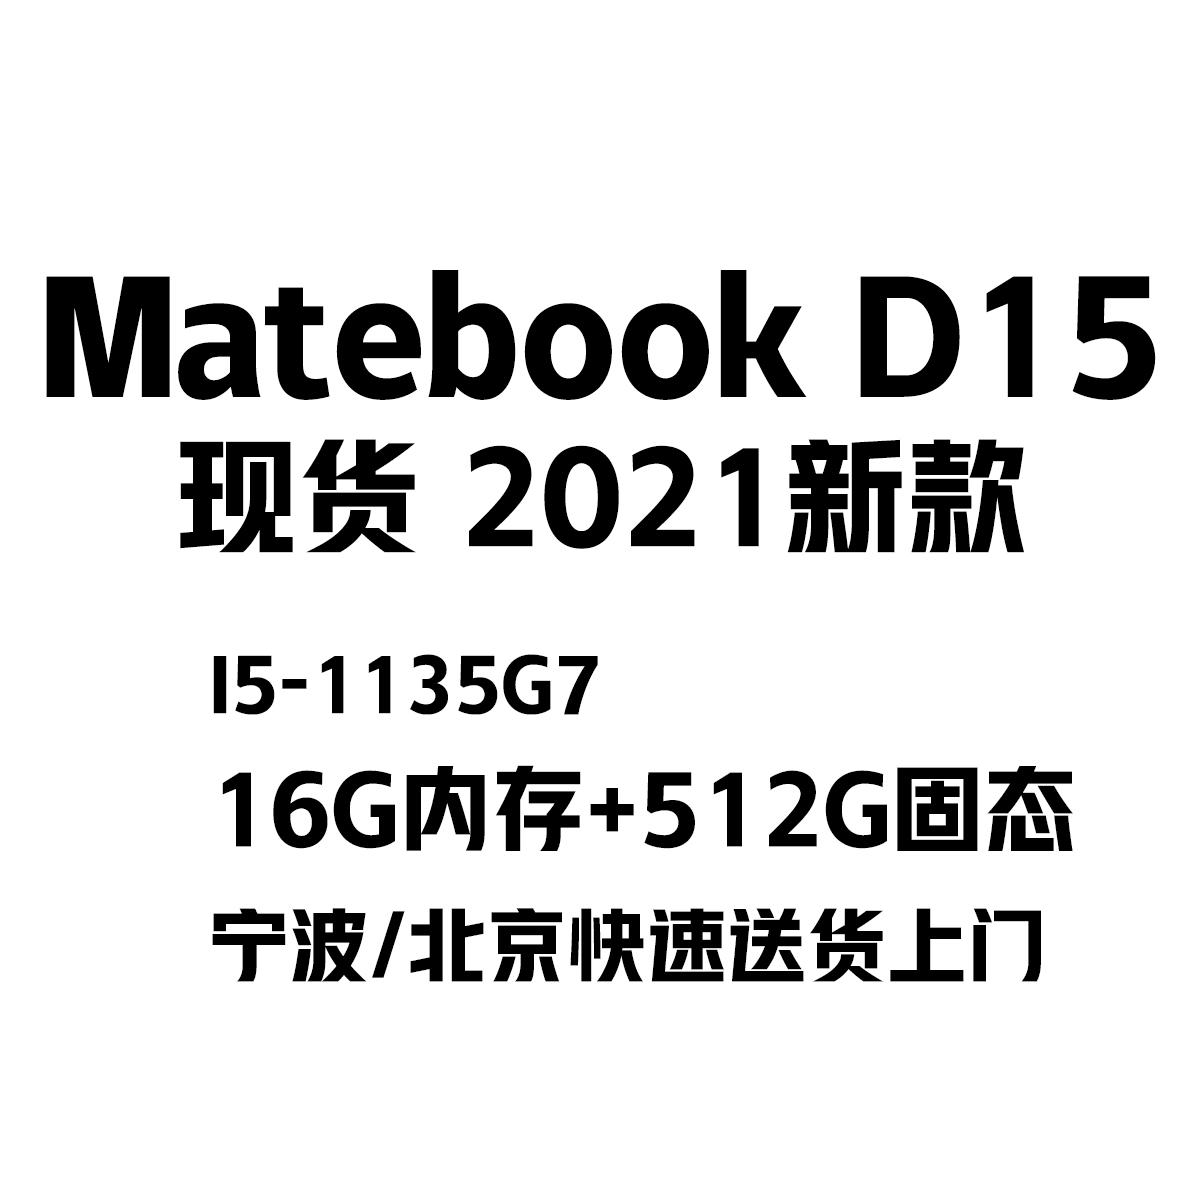 Huawei/ファーウェイMatebook D 15 Boh 2021モデル11世代i 5携帯型コンピュータ大学生オフィス